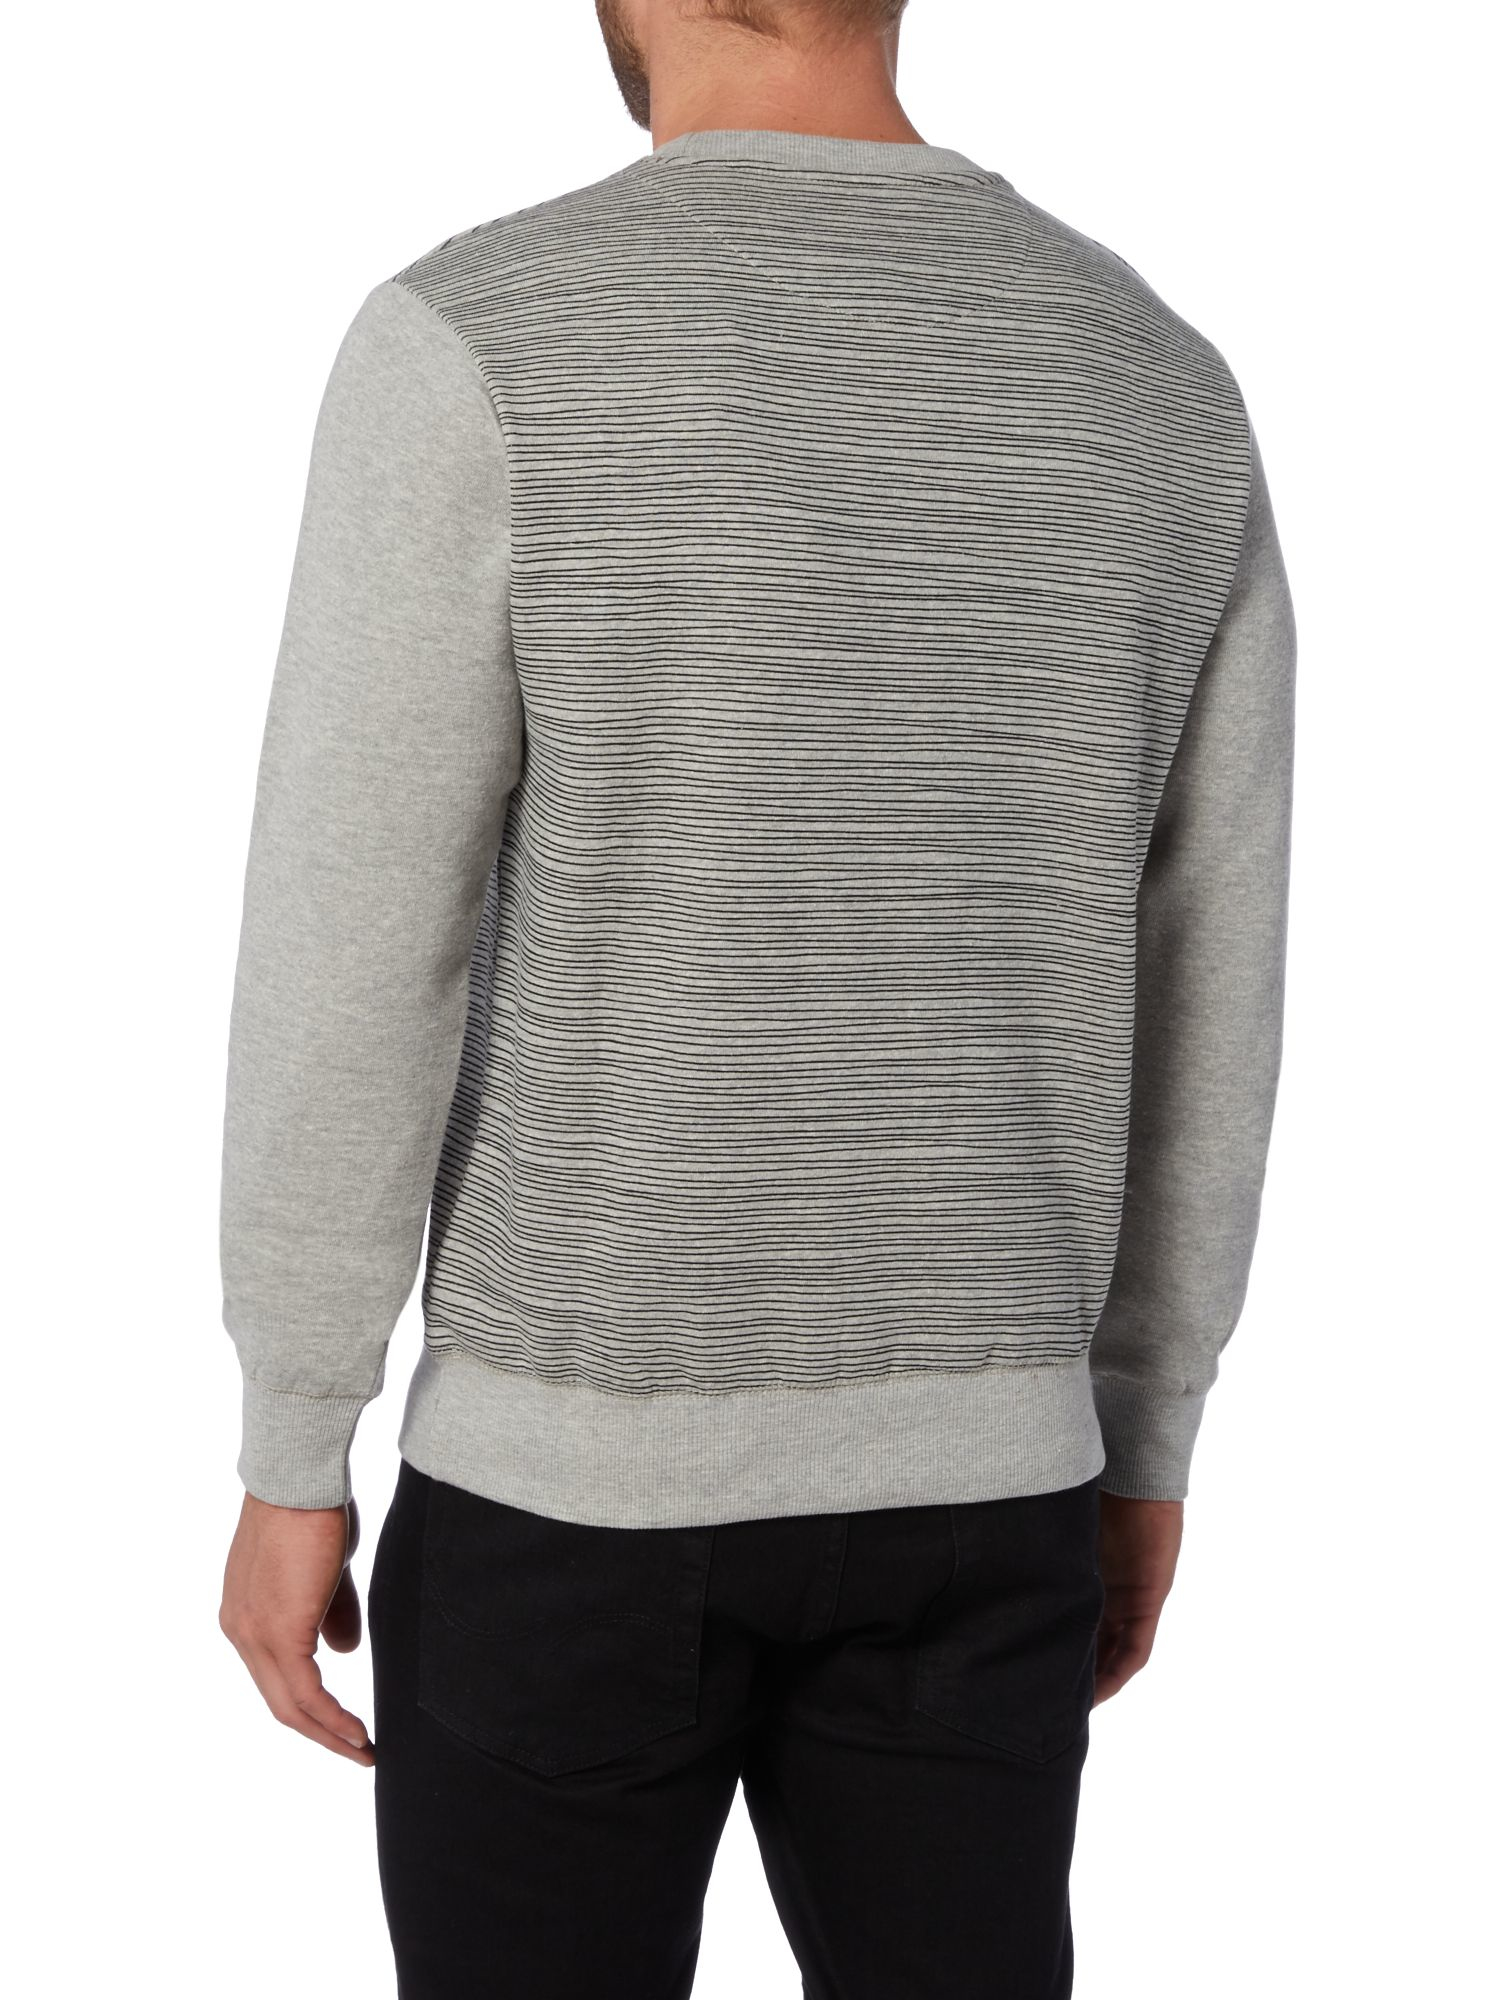 Bellfield Zurbar Finestripe Pattern Crew Neck Jumper in Grey Marl (Grey) for Men